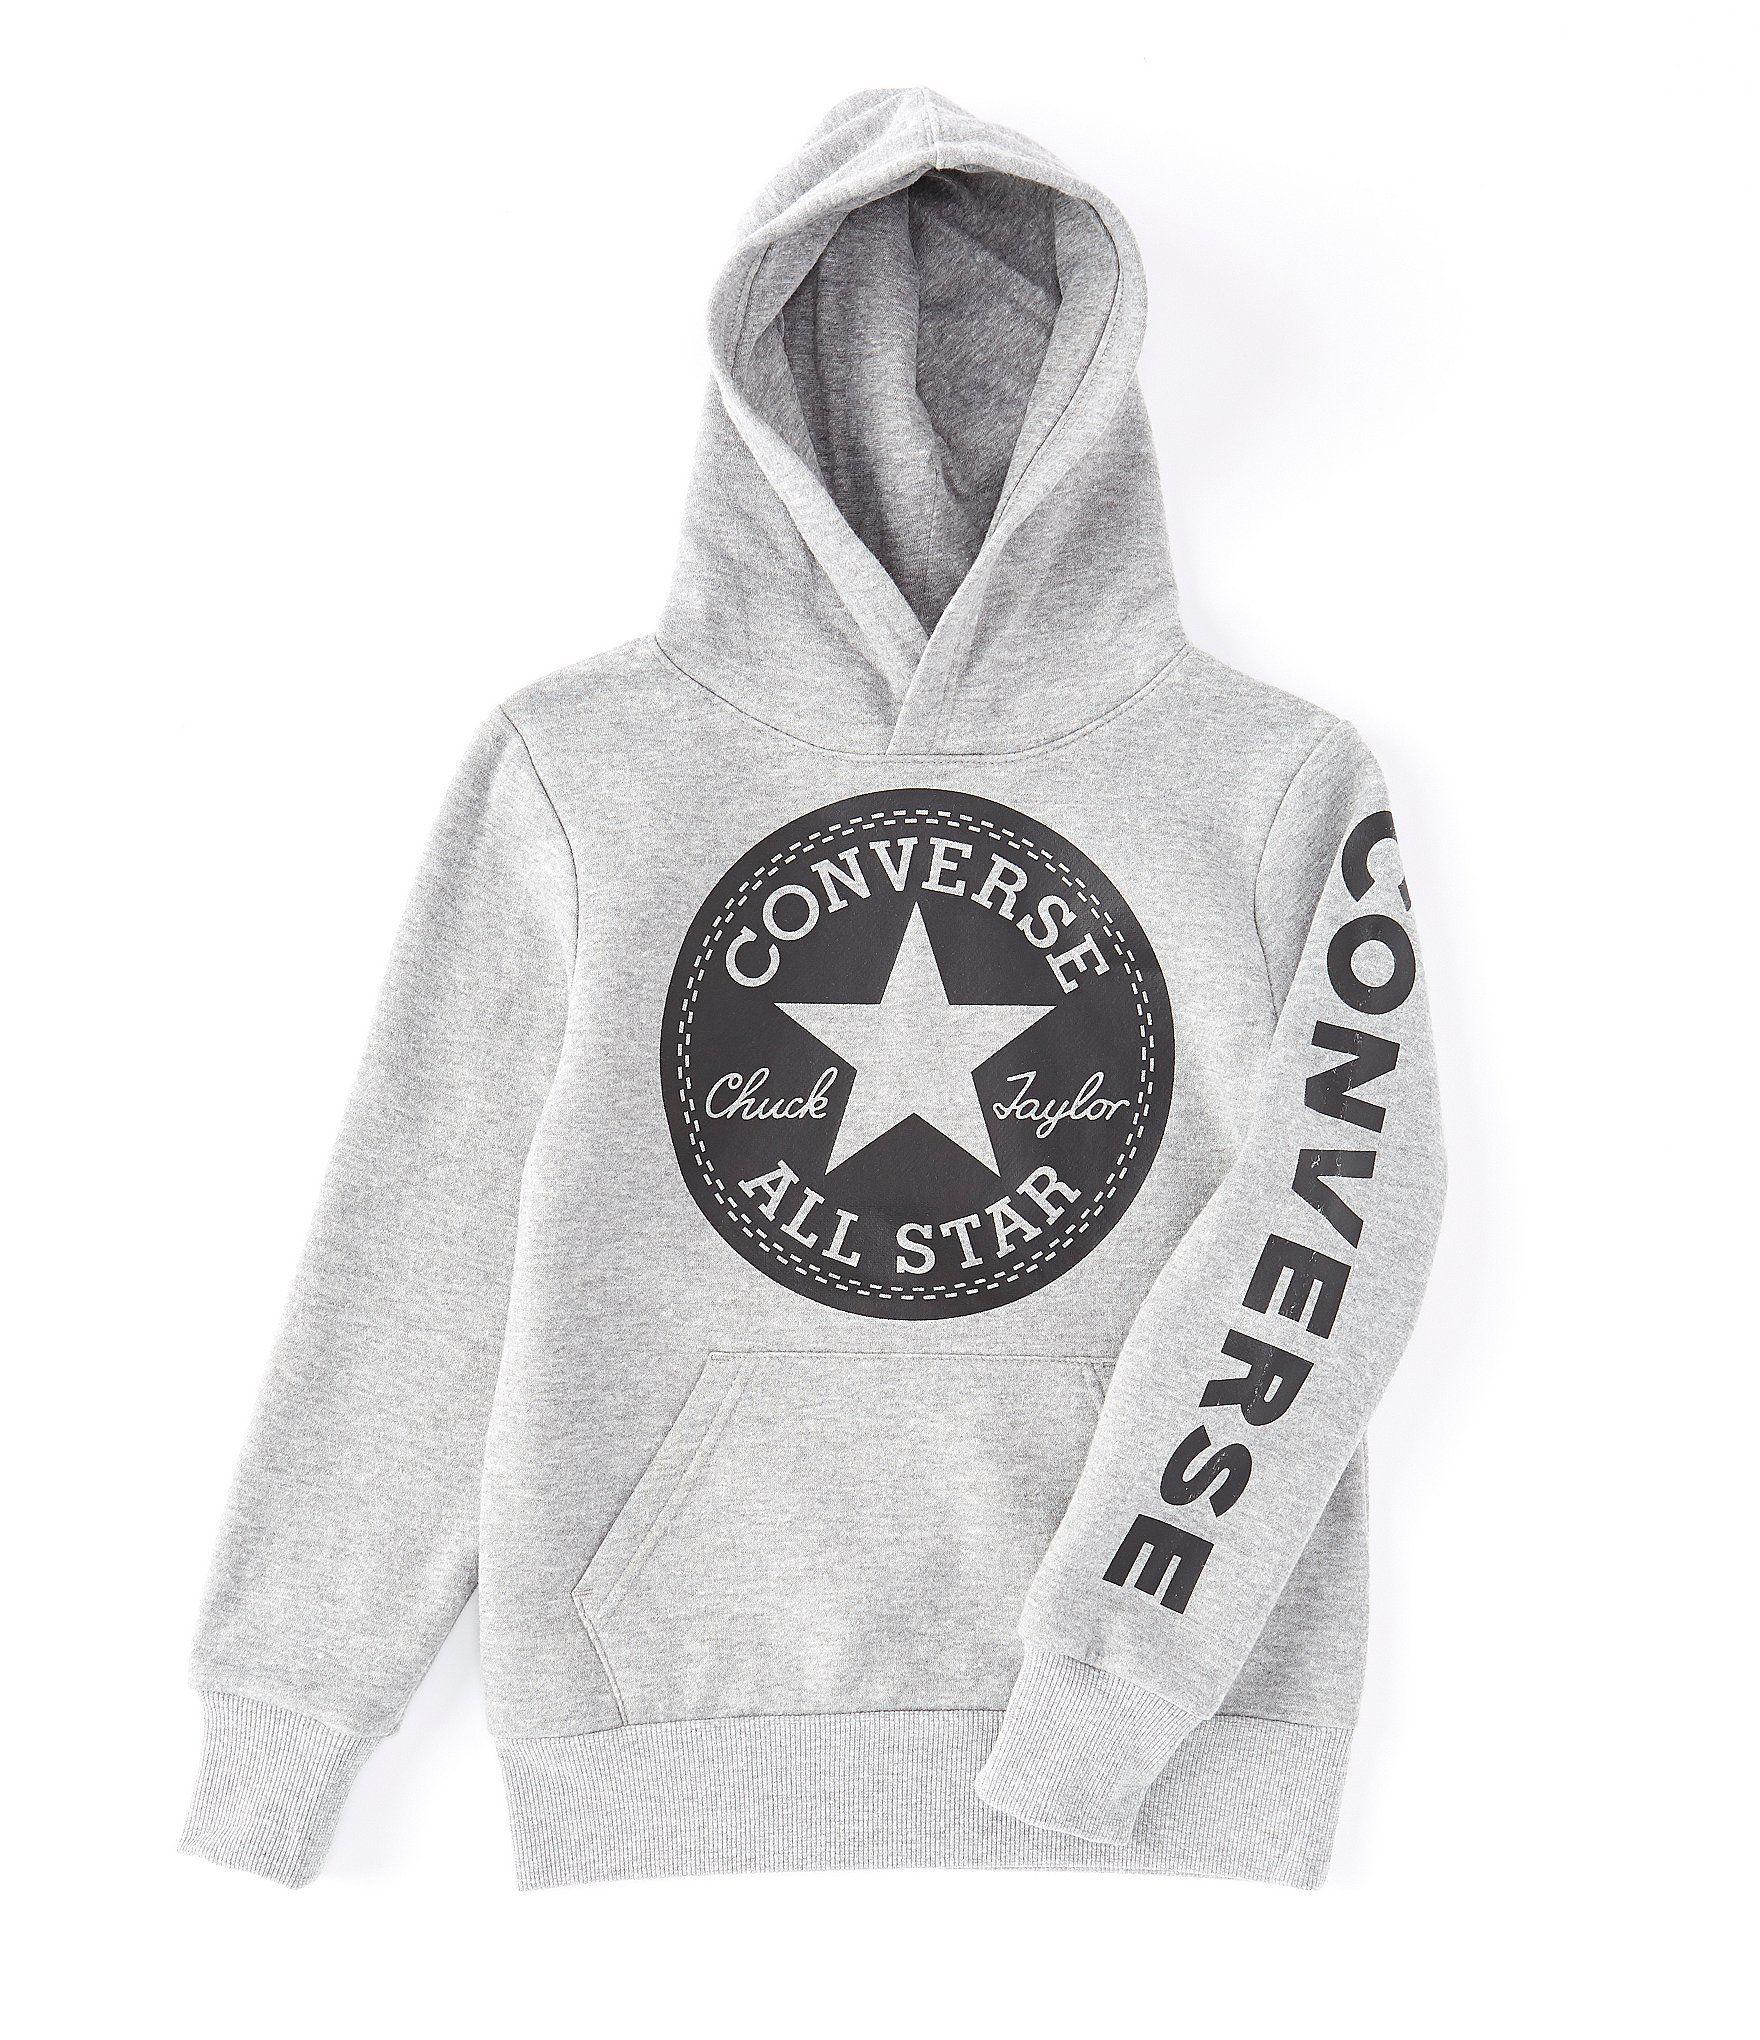 converse chuck taylor sweatshirt